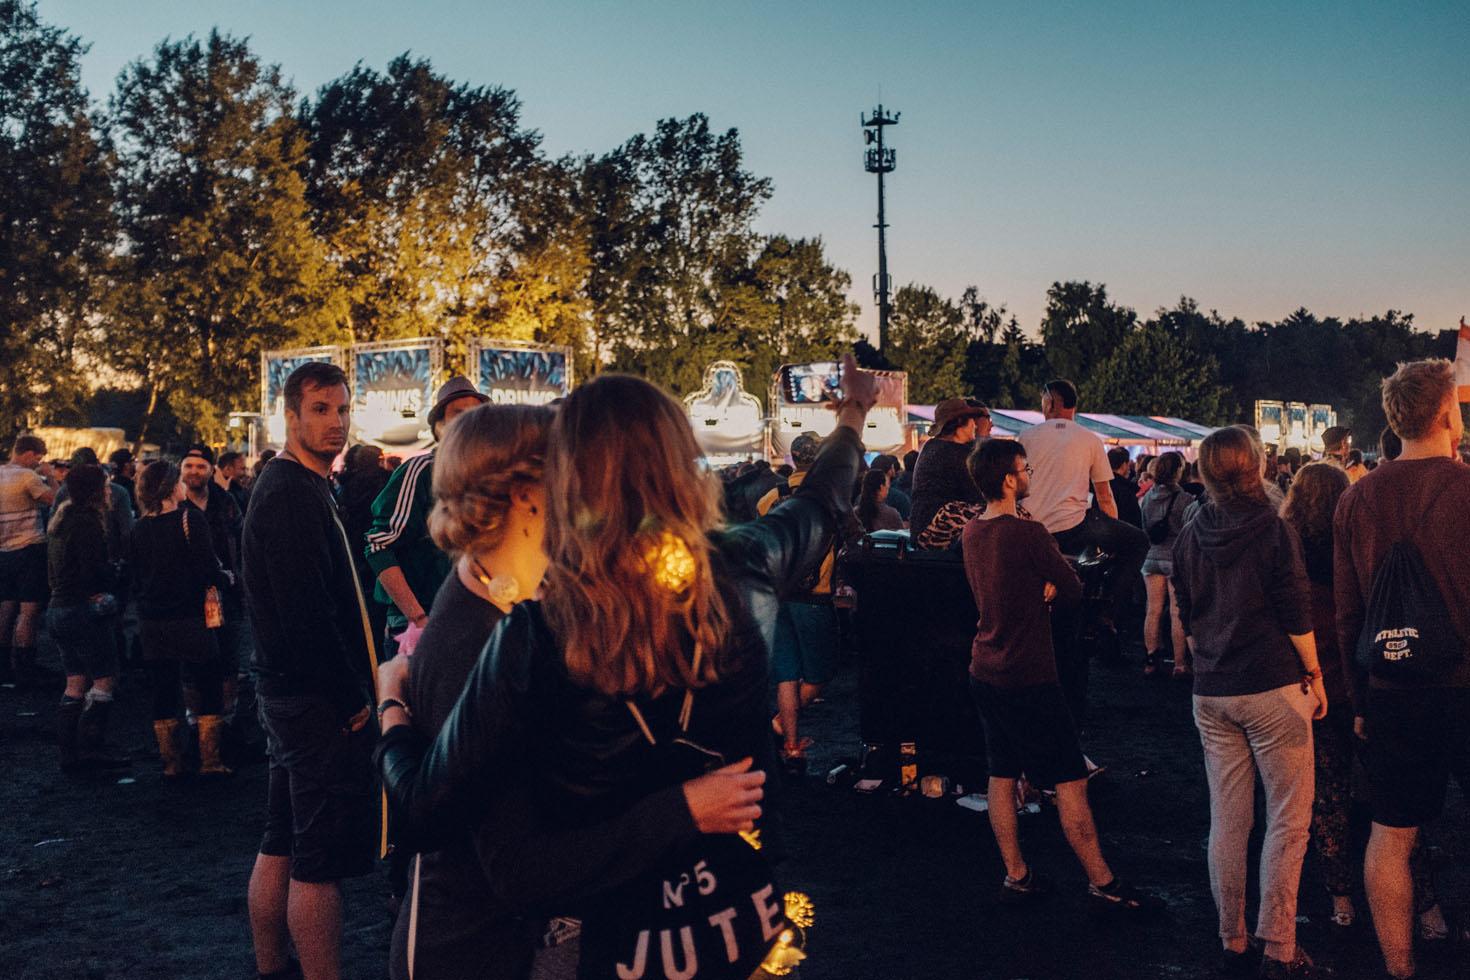 Hurricane-Festival 2016 - Drei Tage Festival-Spaß